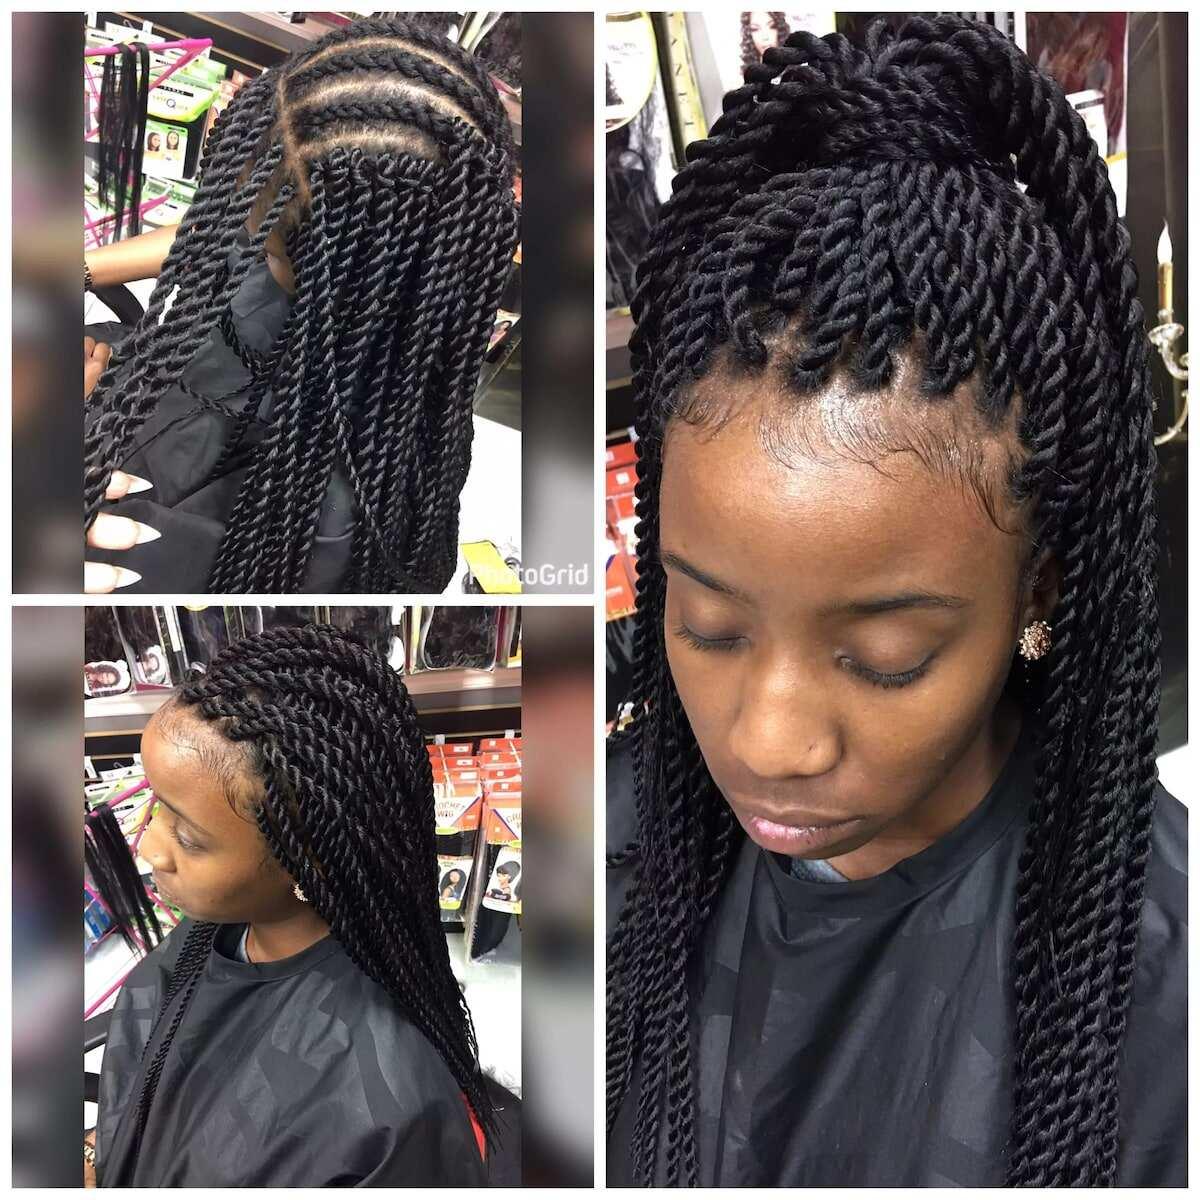 pony hairstyles in ghana, ghana ponytail, ponytail hairstyles in ghana